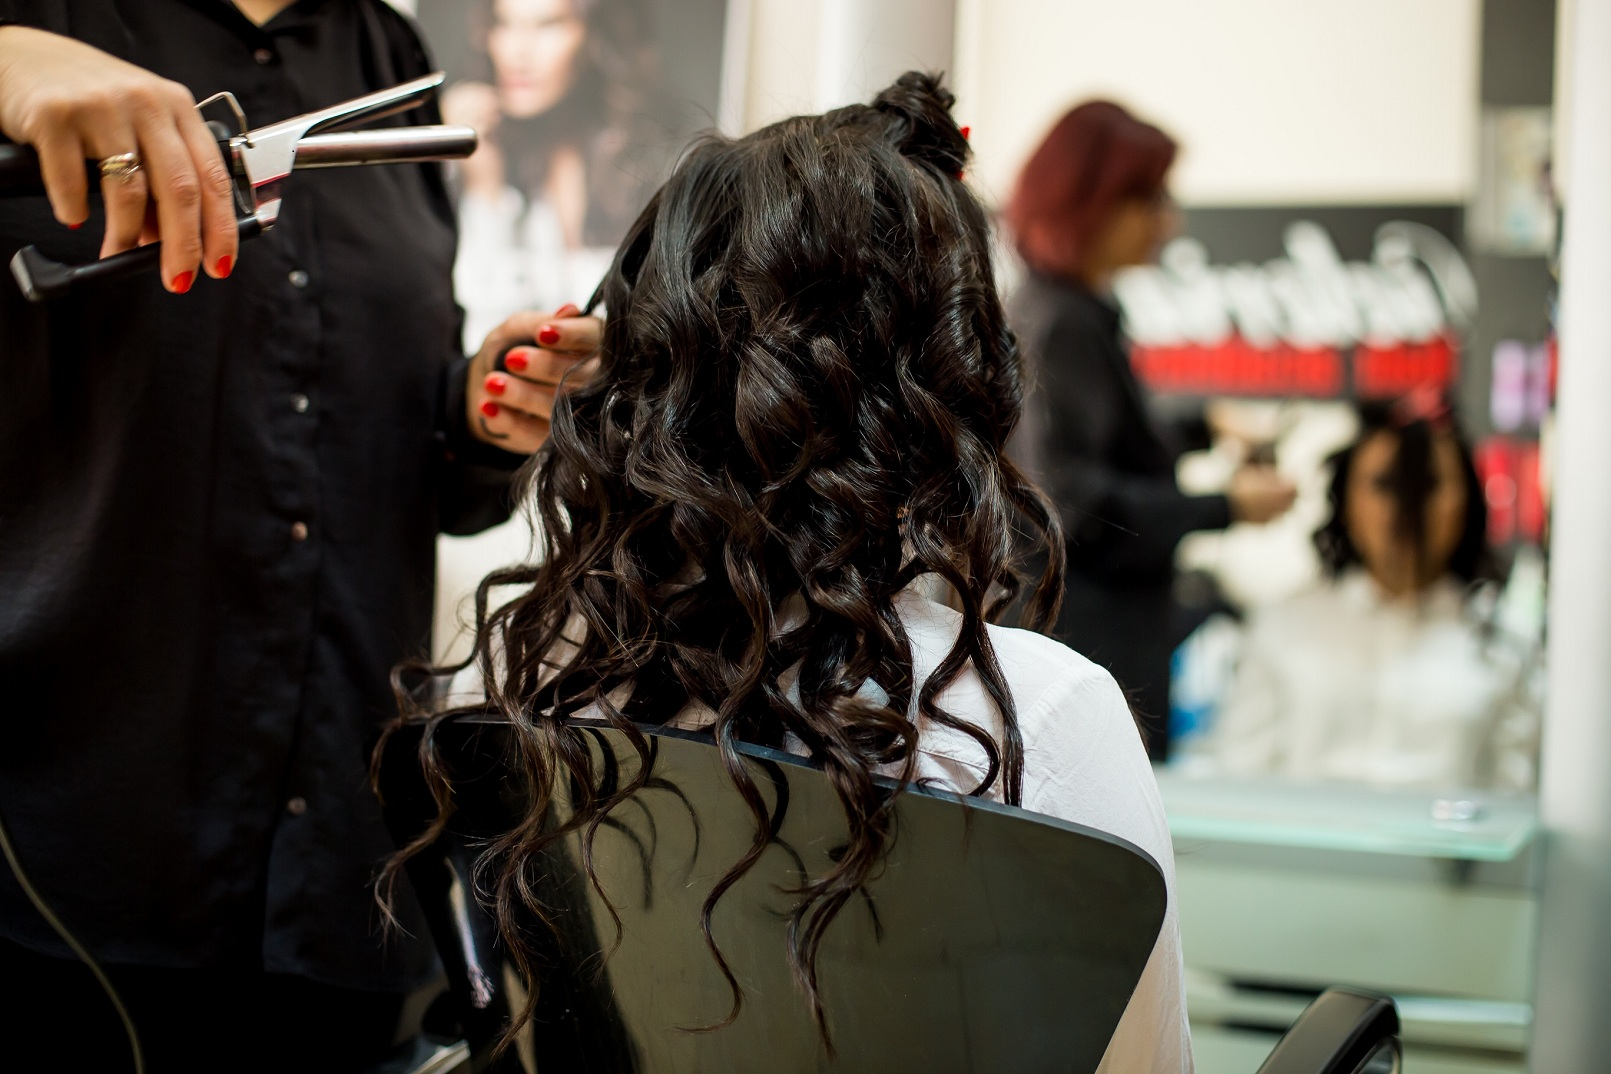 Hair Links Braiders Wanted Black Hair Stylists Wanted Alexandria